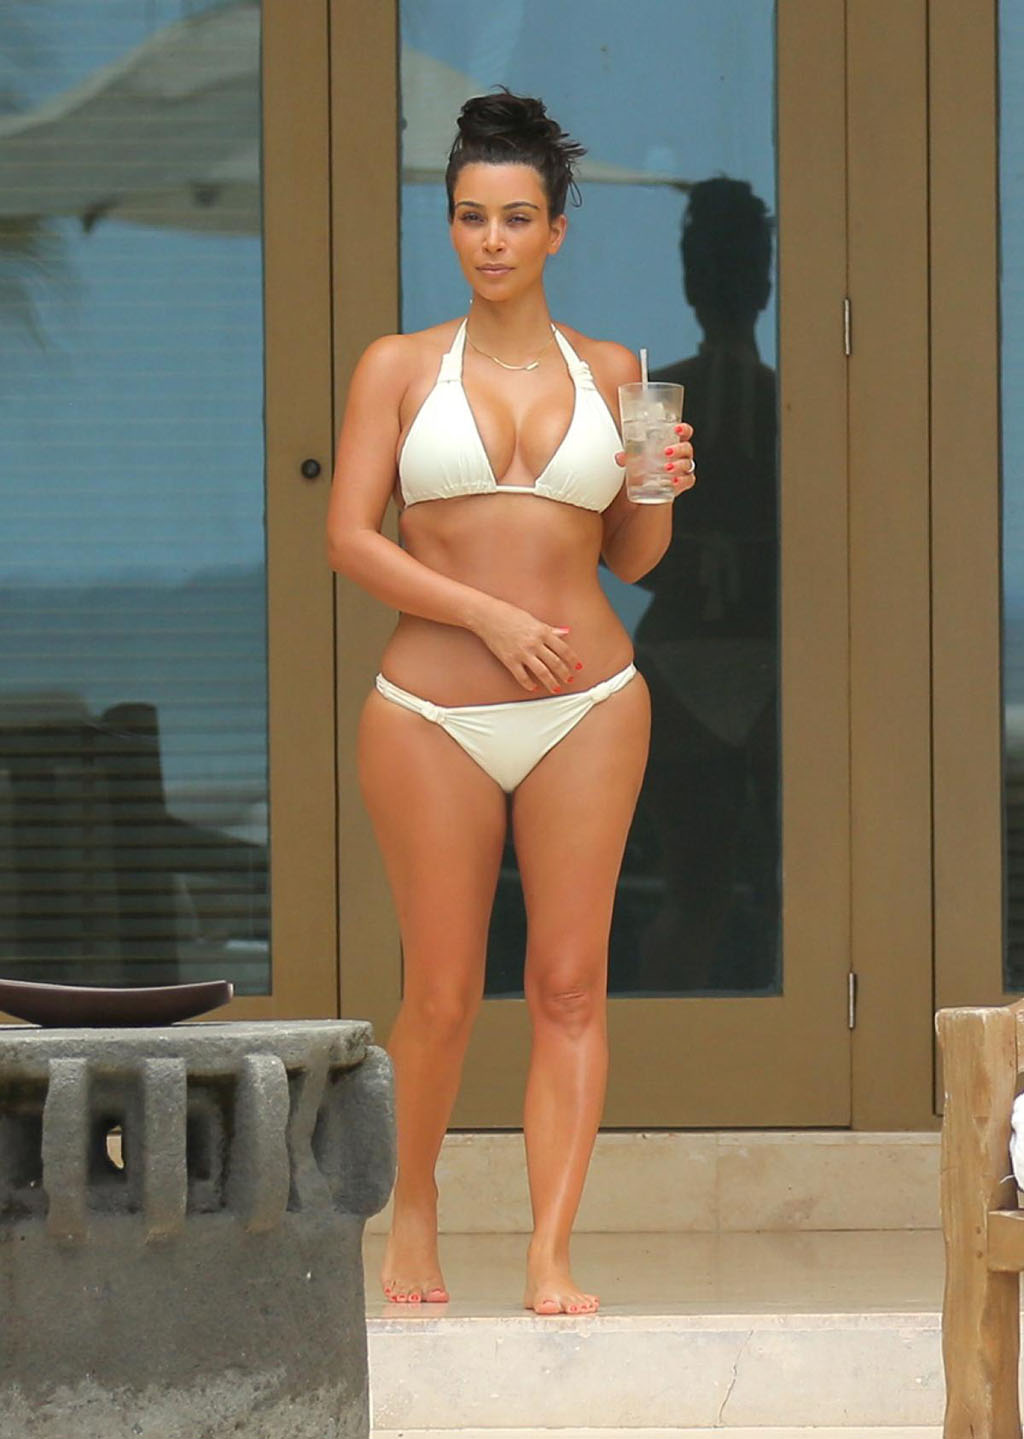 kim-kardashian-ivorybikini-cocktail1024x